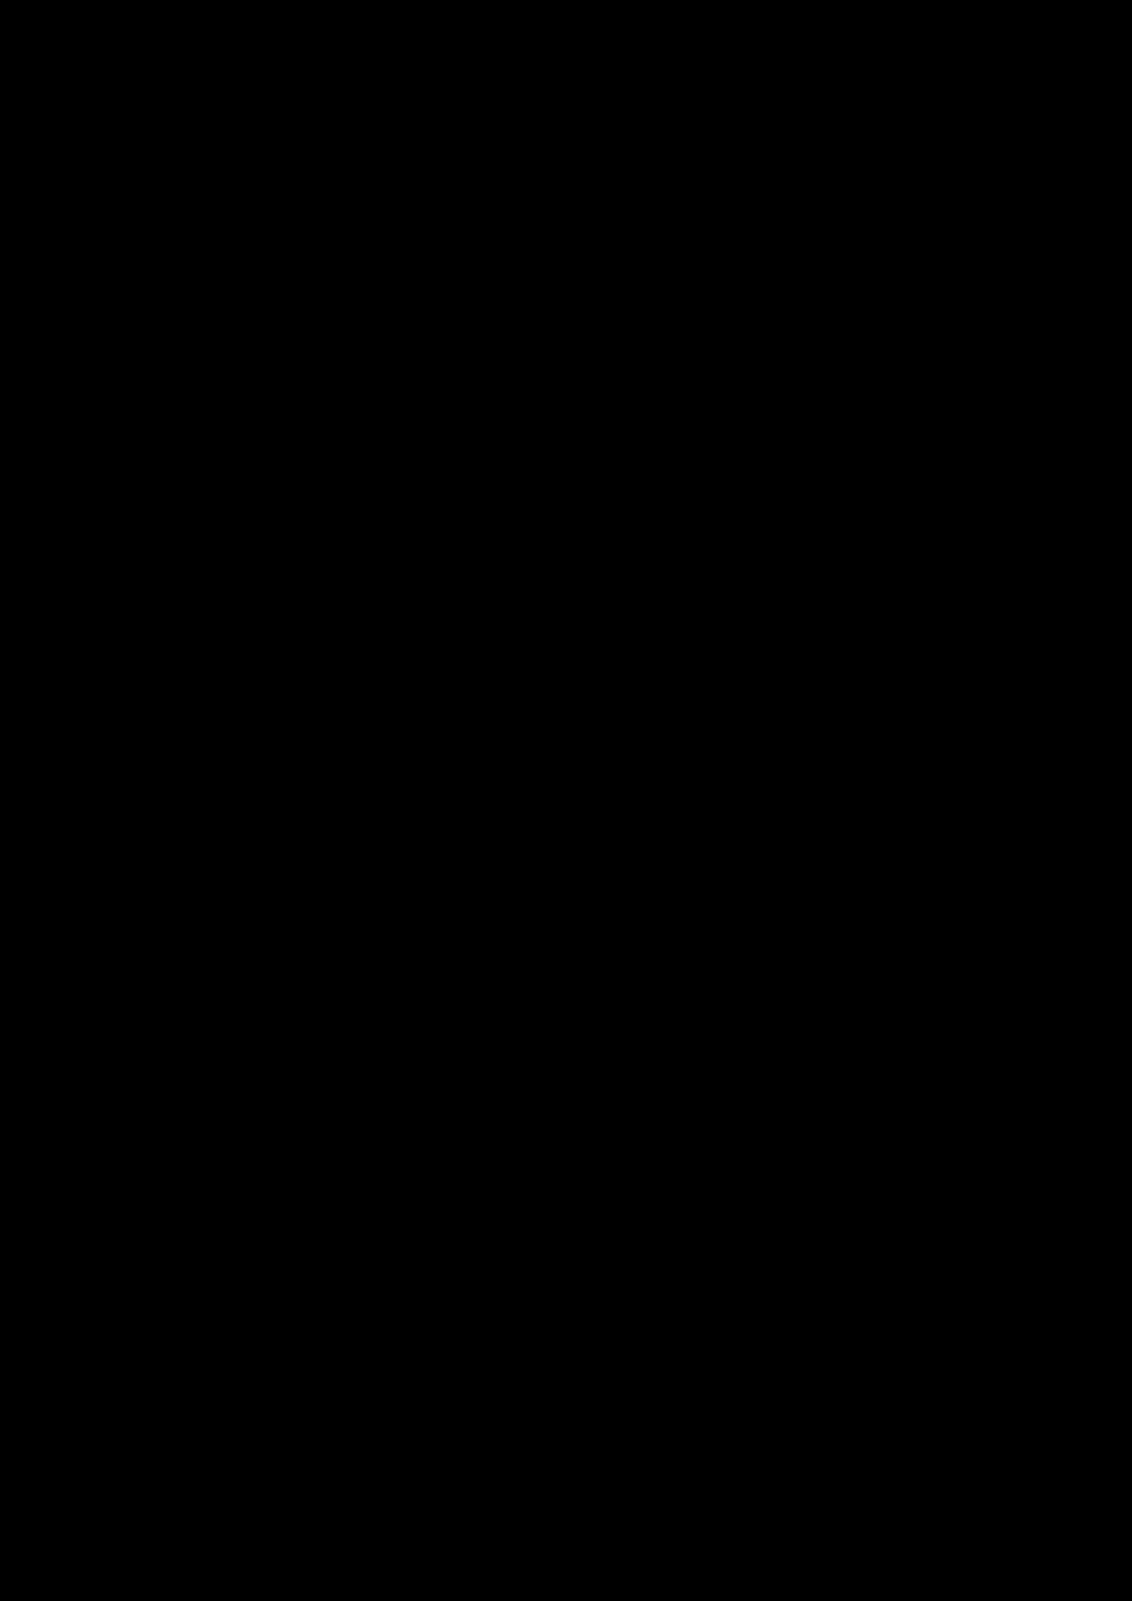 Ten lyubvi slide, Image 34